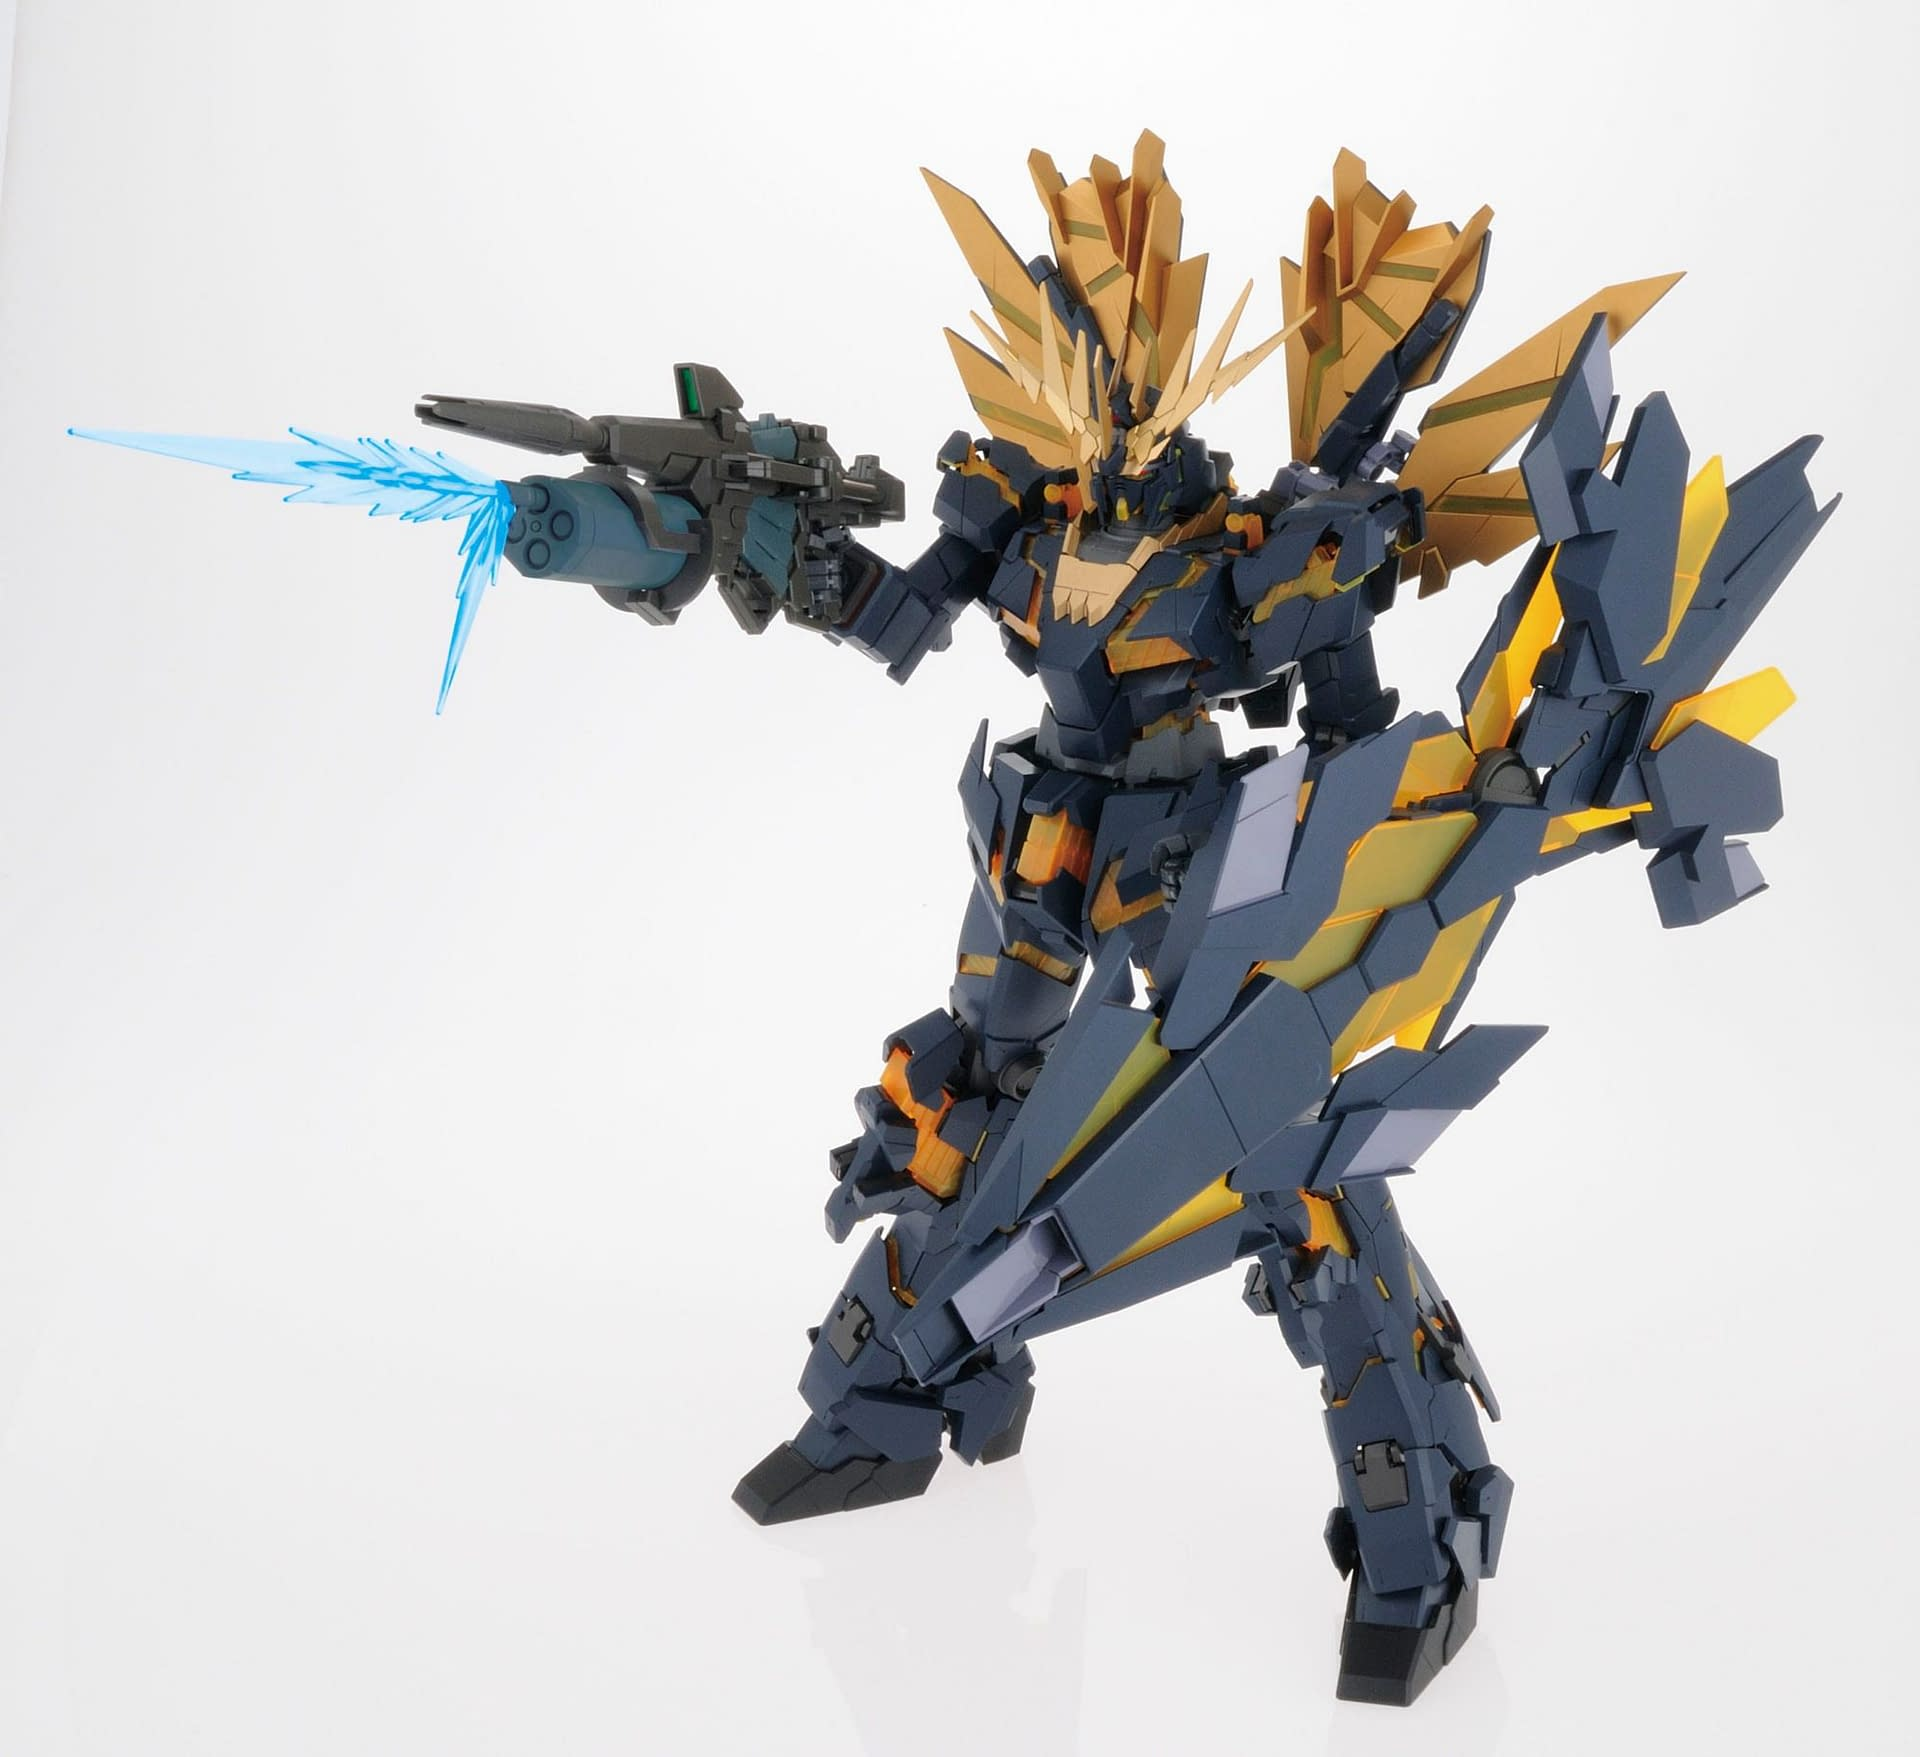 PG_RX-0_Unicorn_Gundam_02_Banshee_Norn_15_